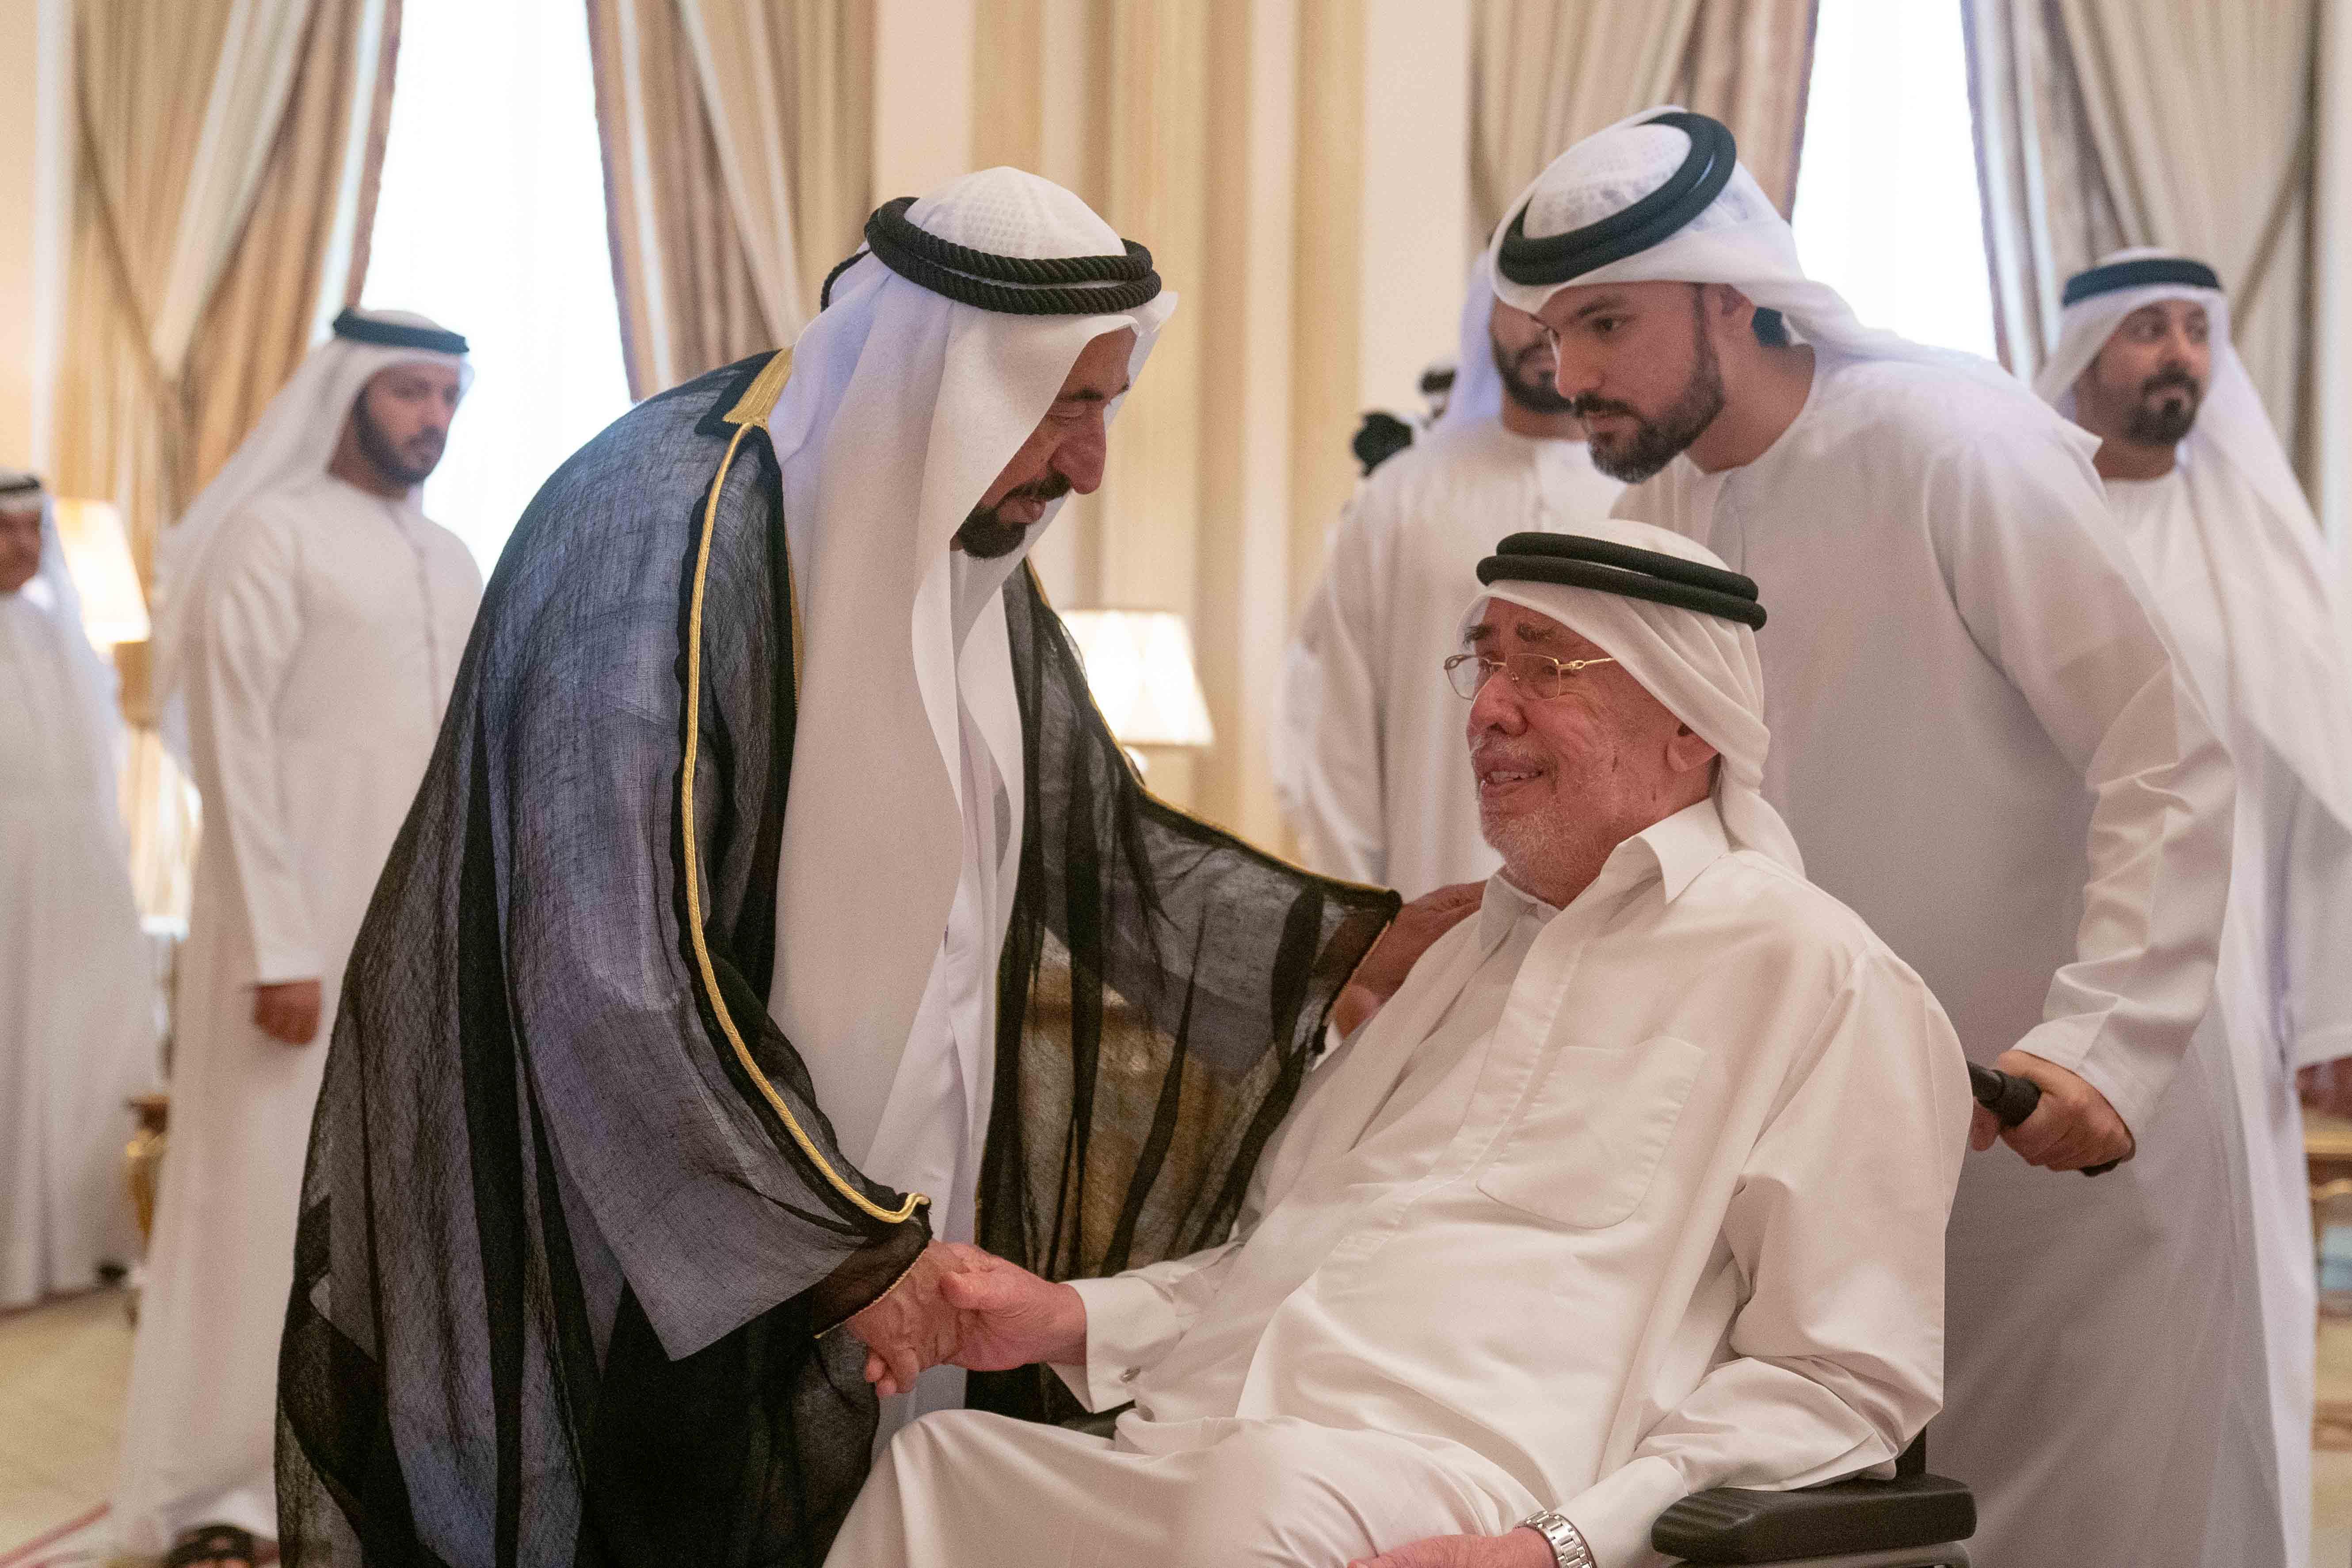 Emirates News Agency - Sharjah Ruler receives condolences on death